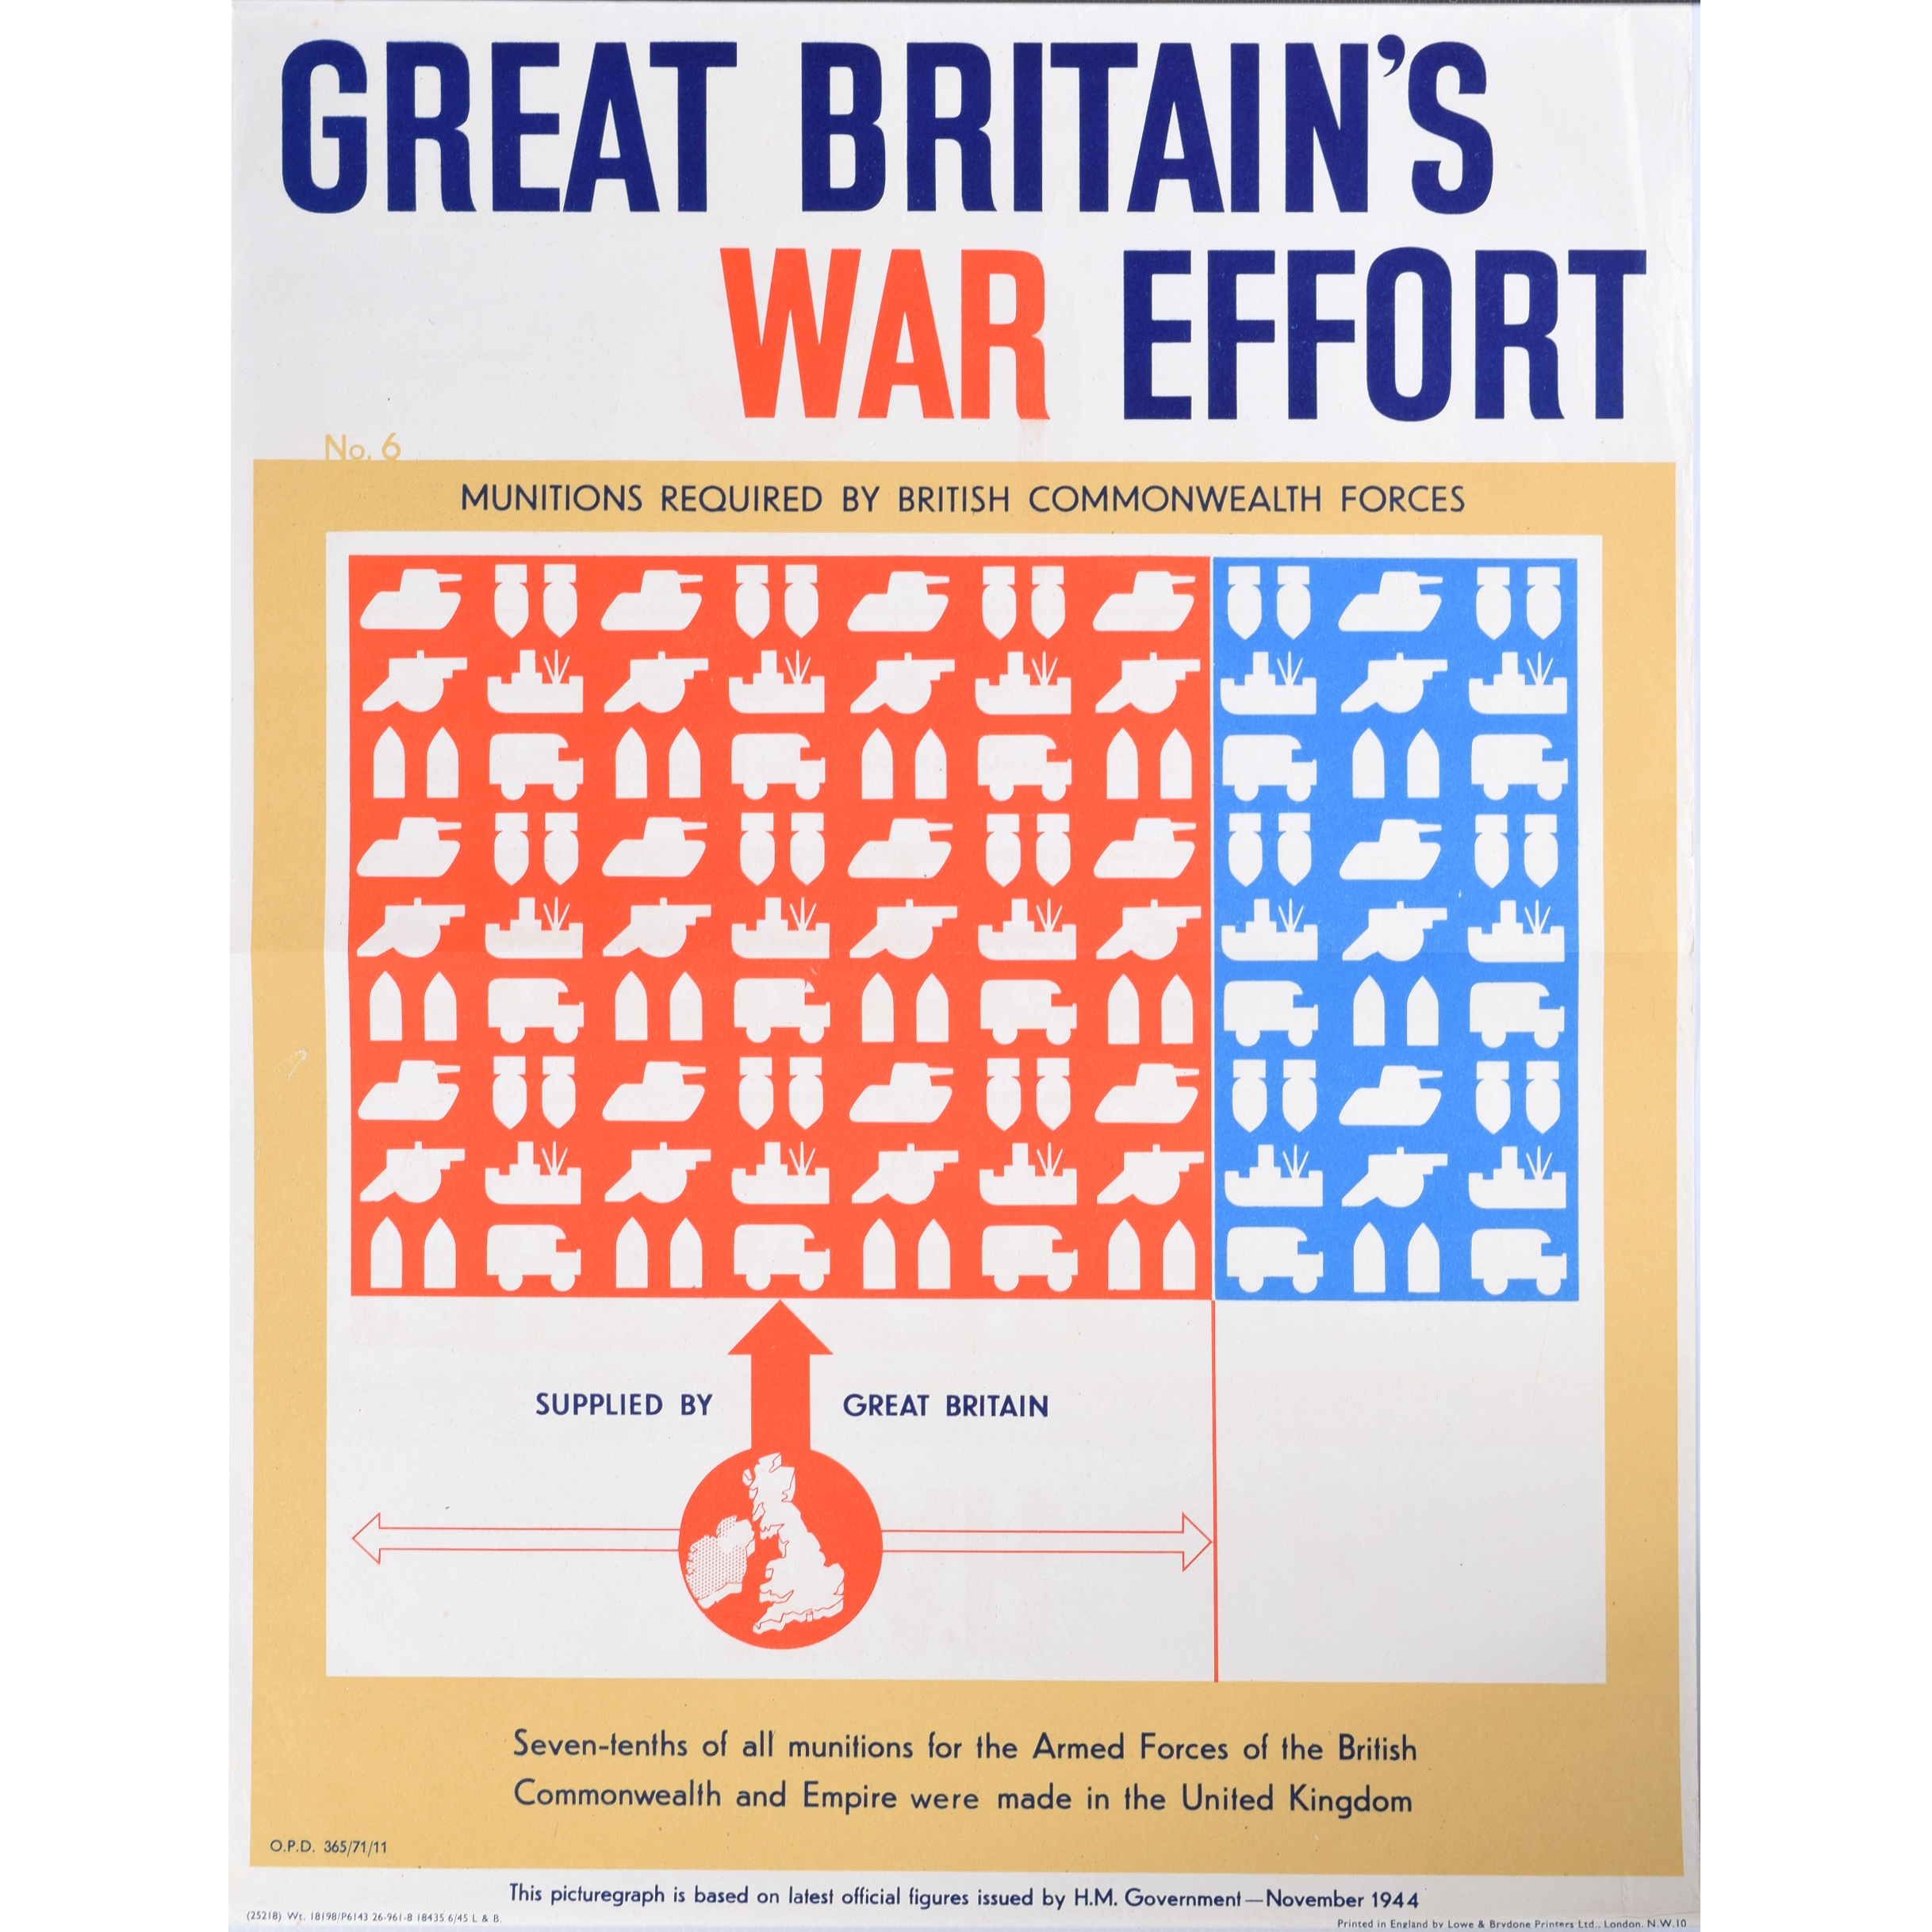 1944 UK poster: Great Britain's War Effort (Munitions) - World War II propaganda